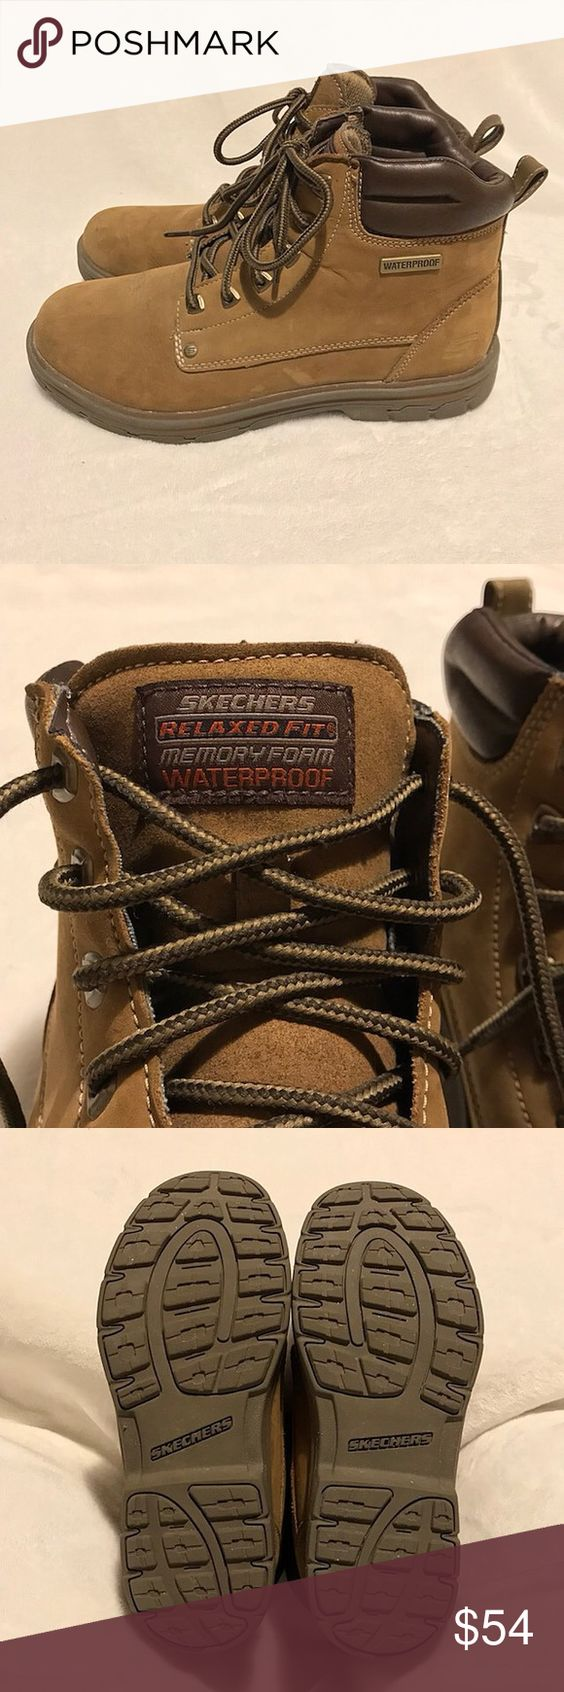 Men's Skechers Memory Foam Work Boots